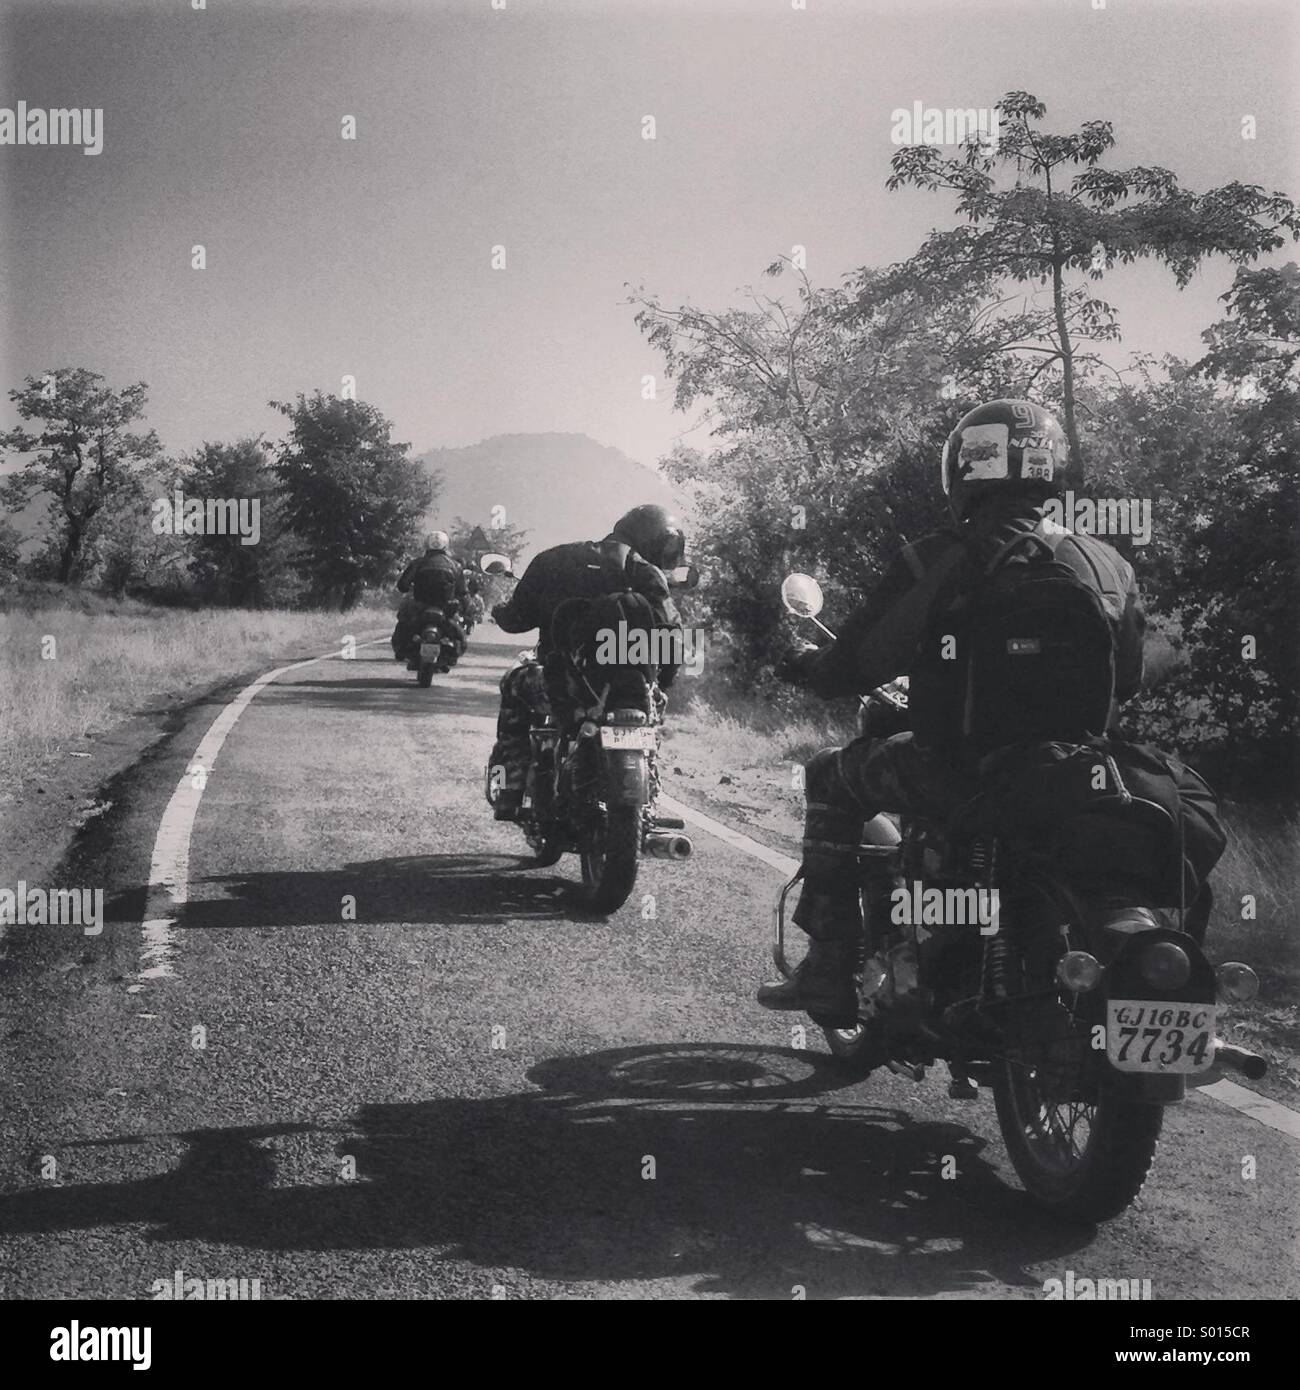 #ride #wanderlust #motorcycles #roadtrips - Stock Image